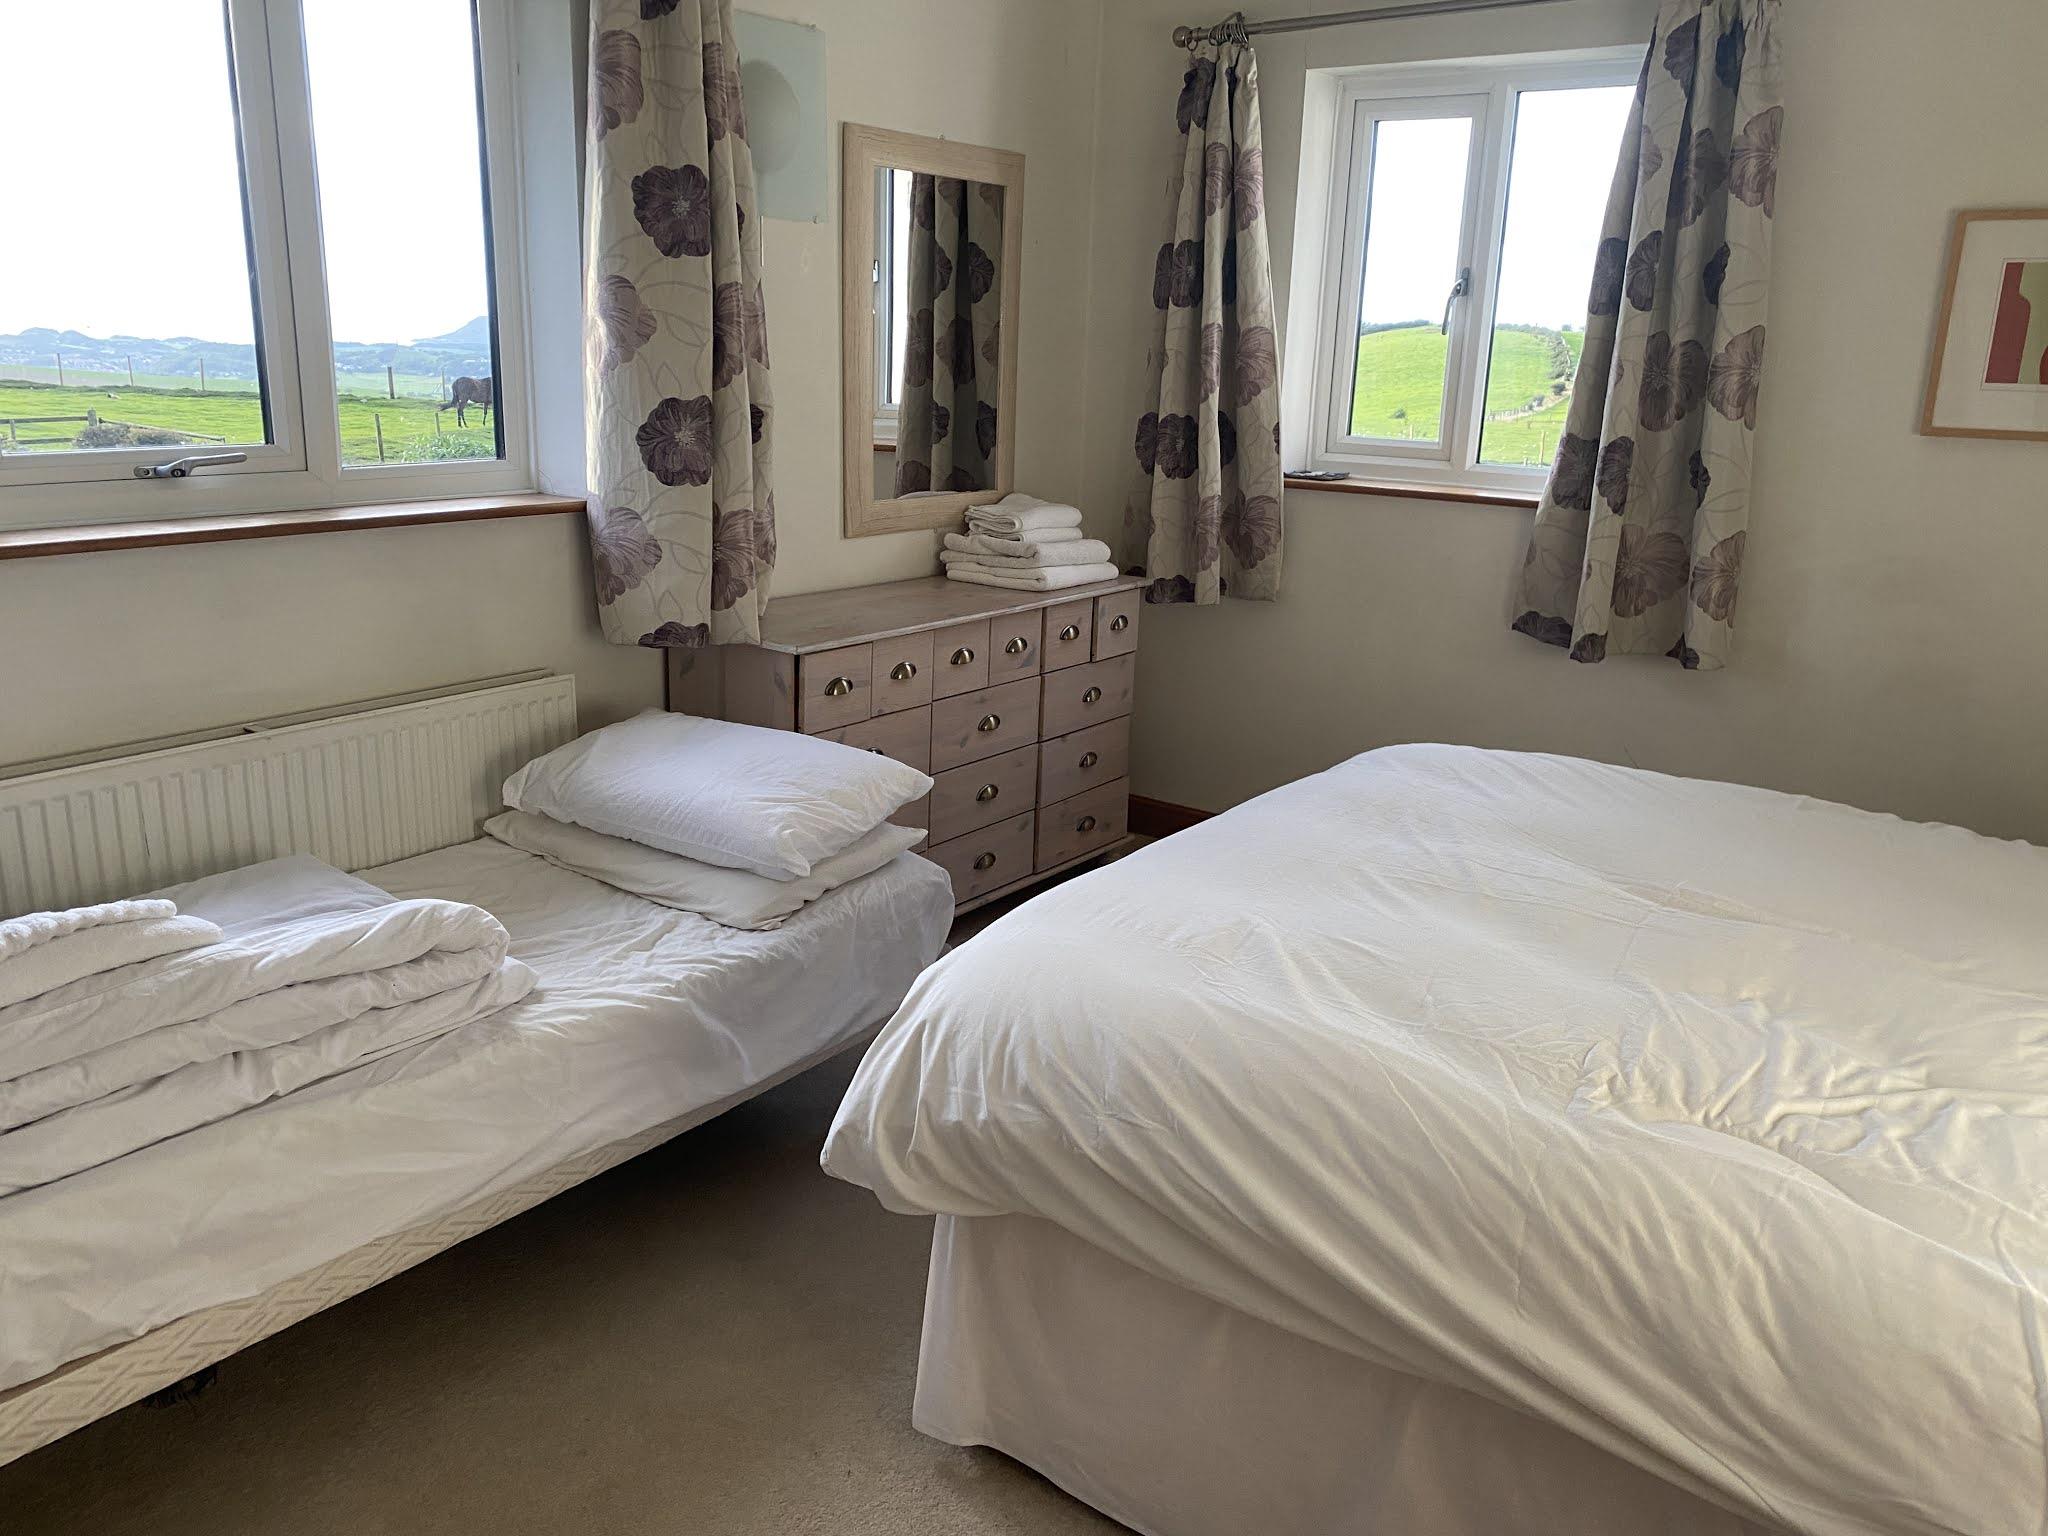 Snowdonia View Farmhouse - master bedroom